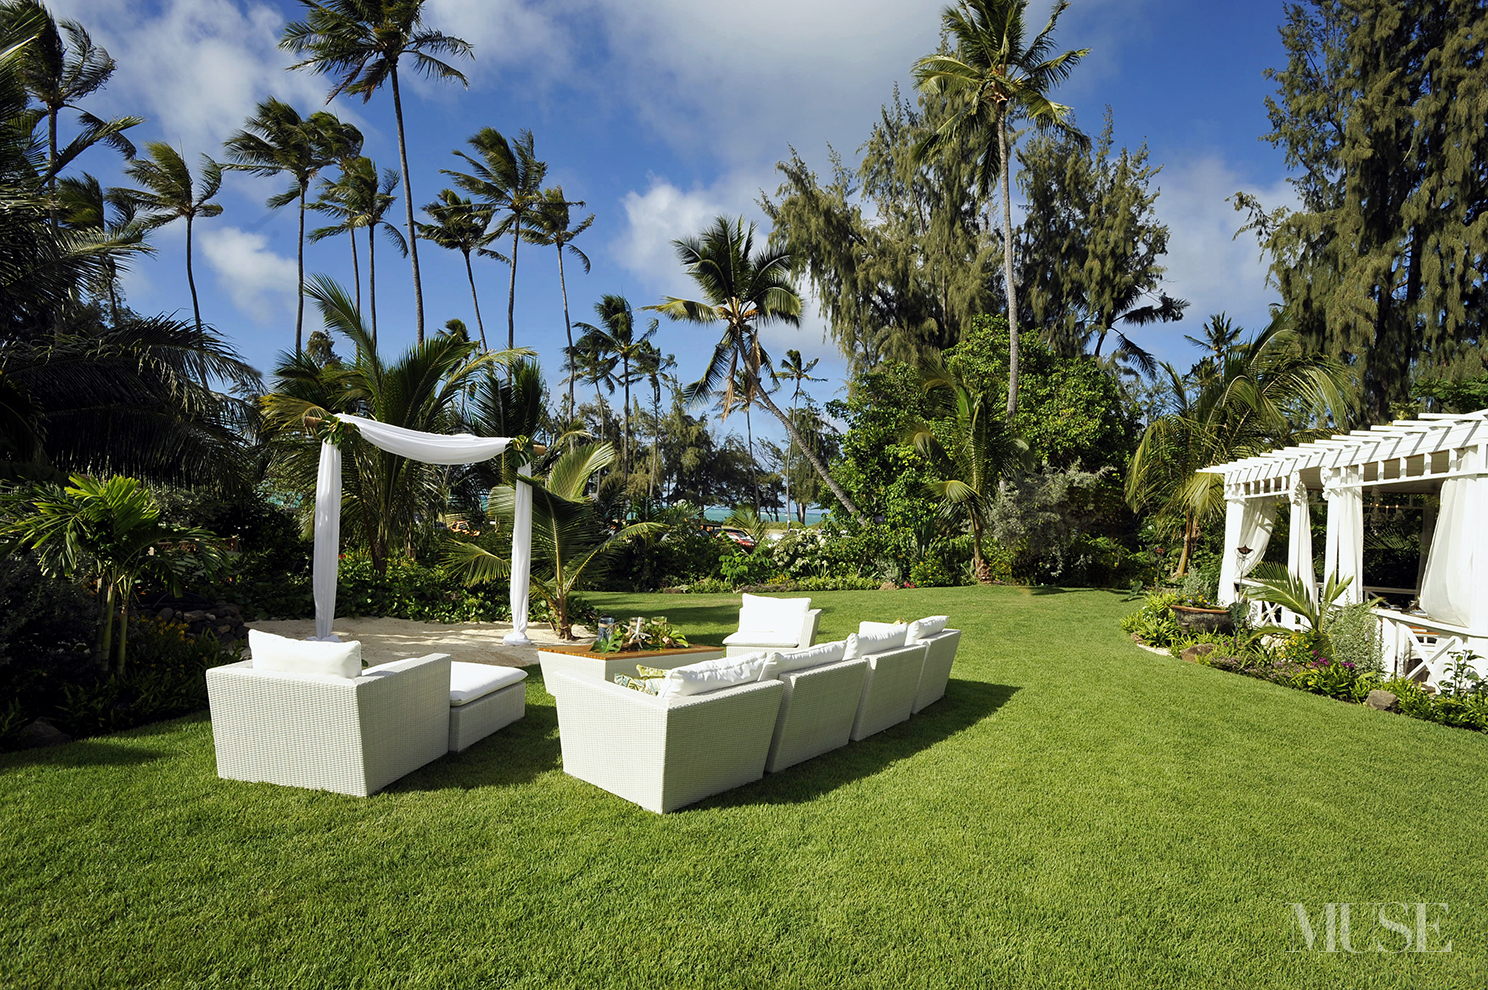 Maleana Gardens Editorial